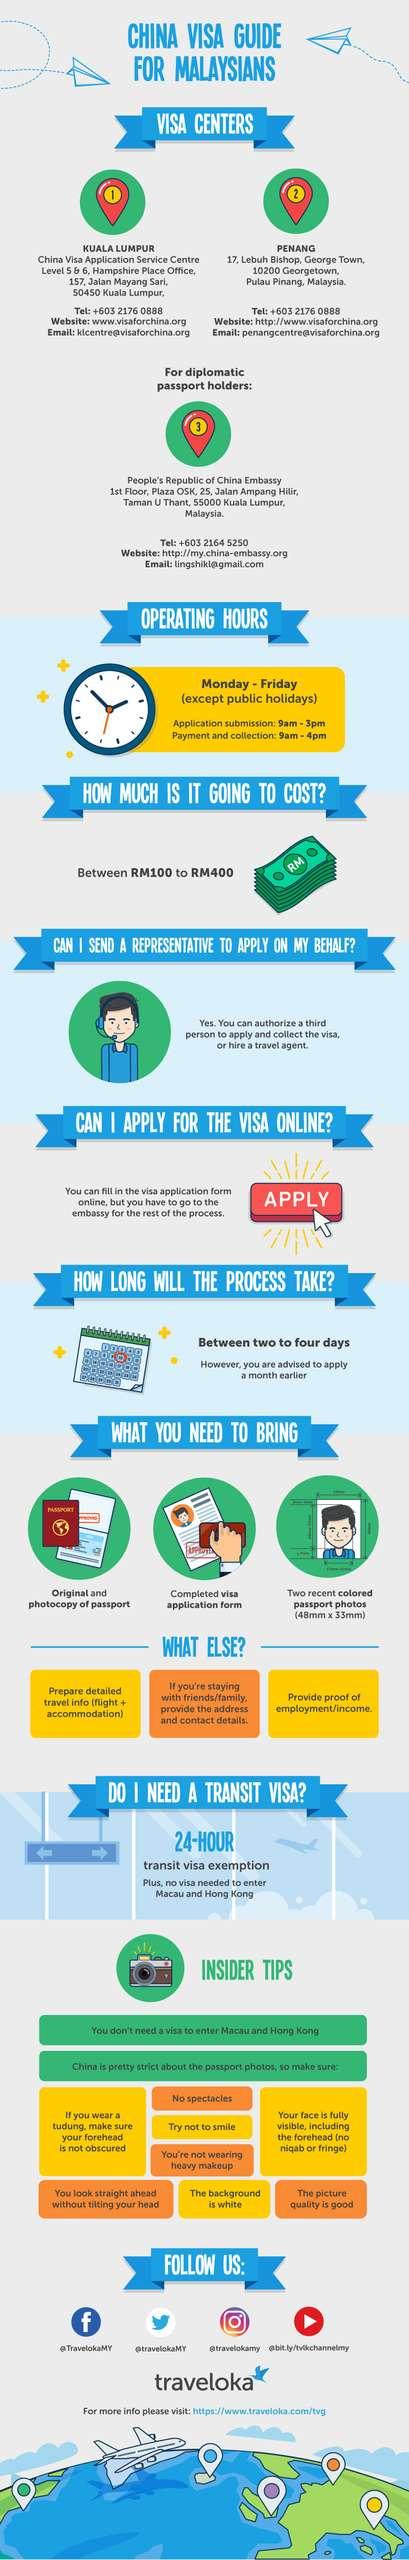 China Visa Application Infographic 2020